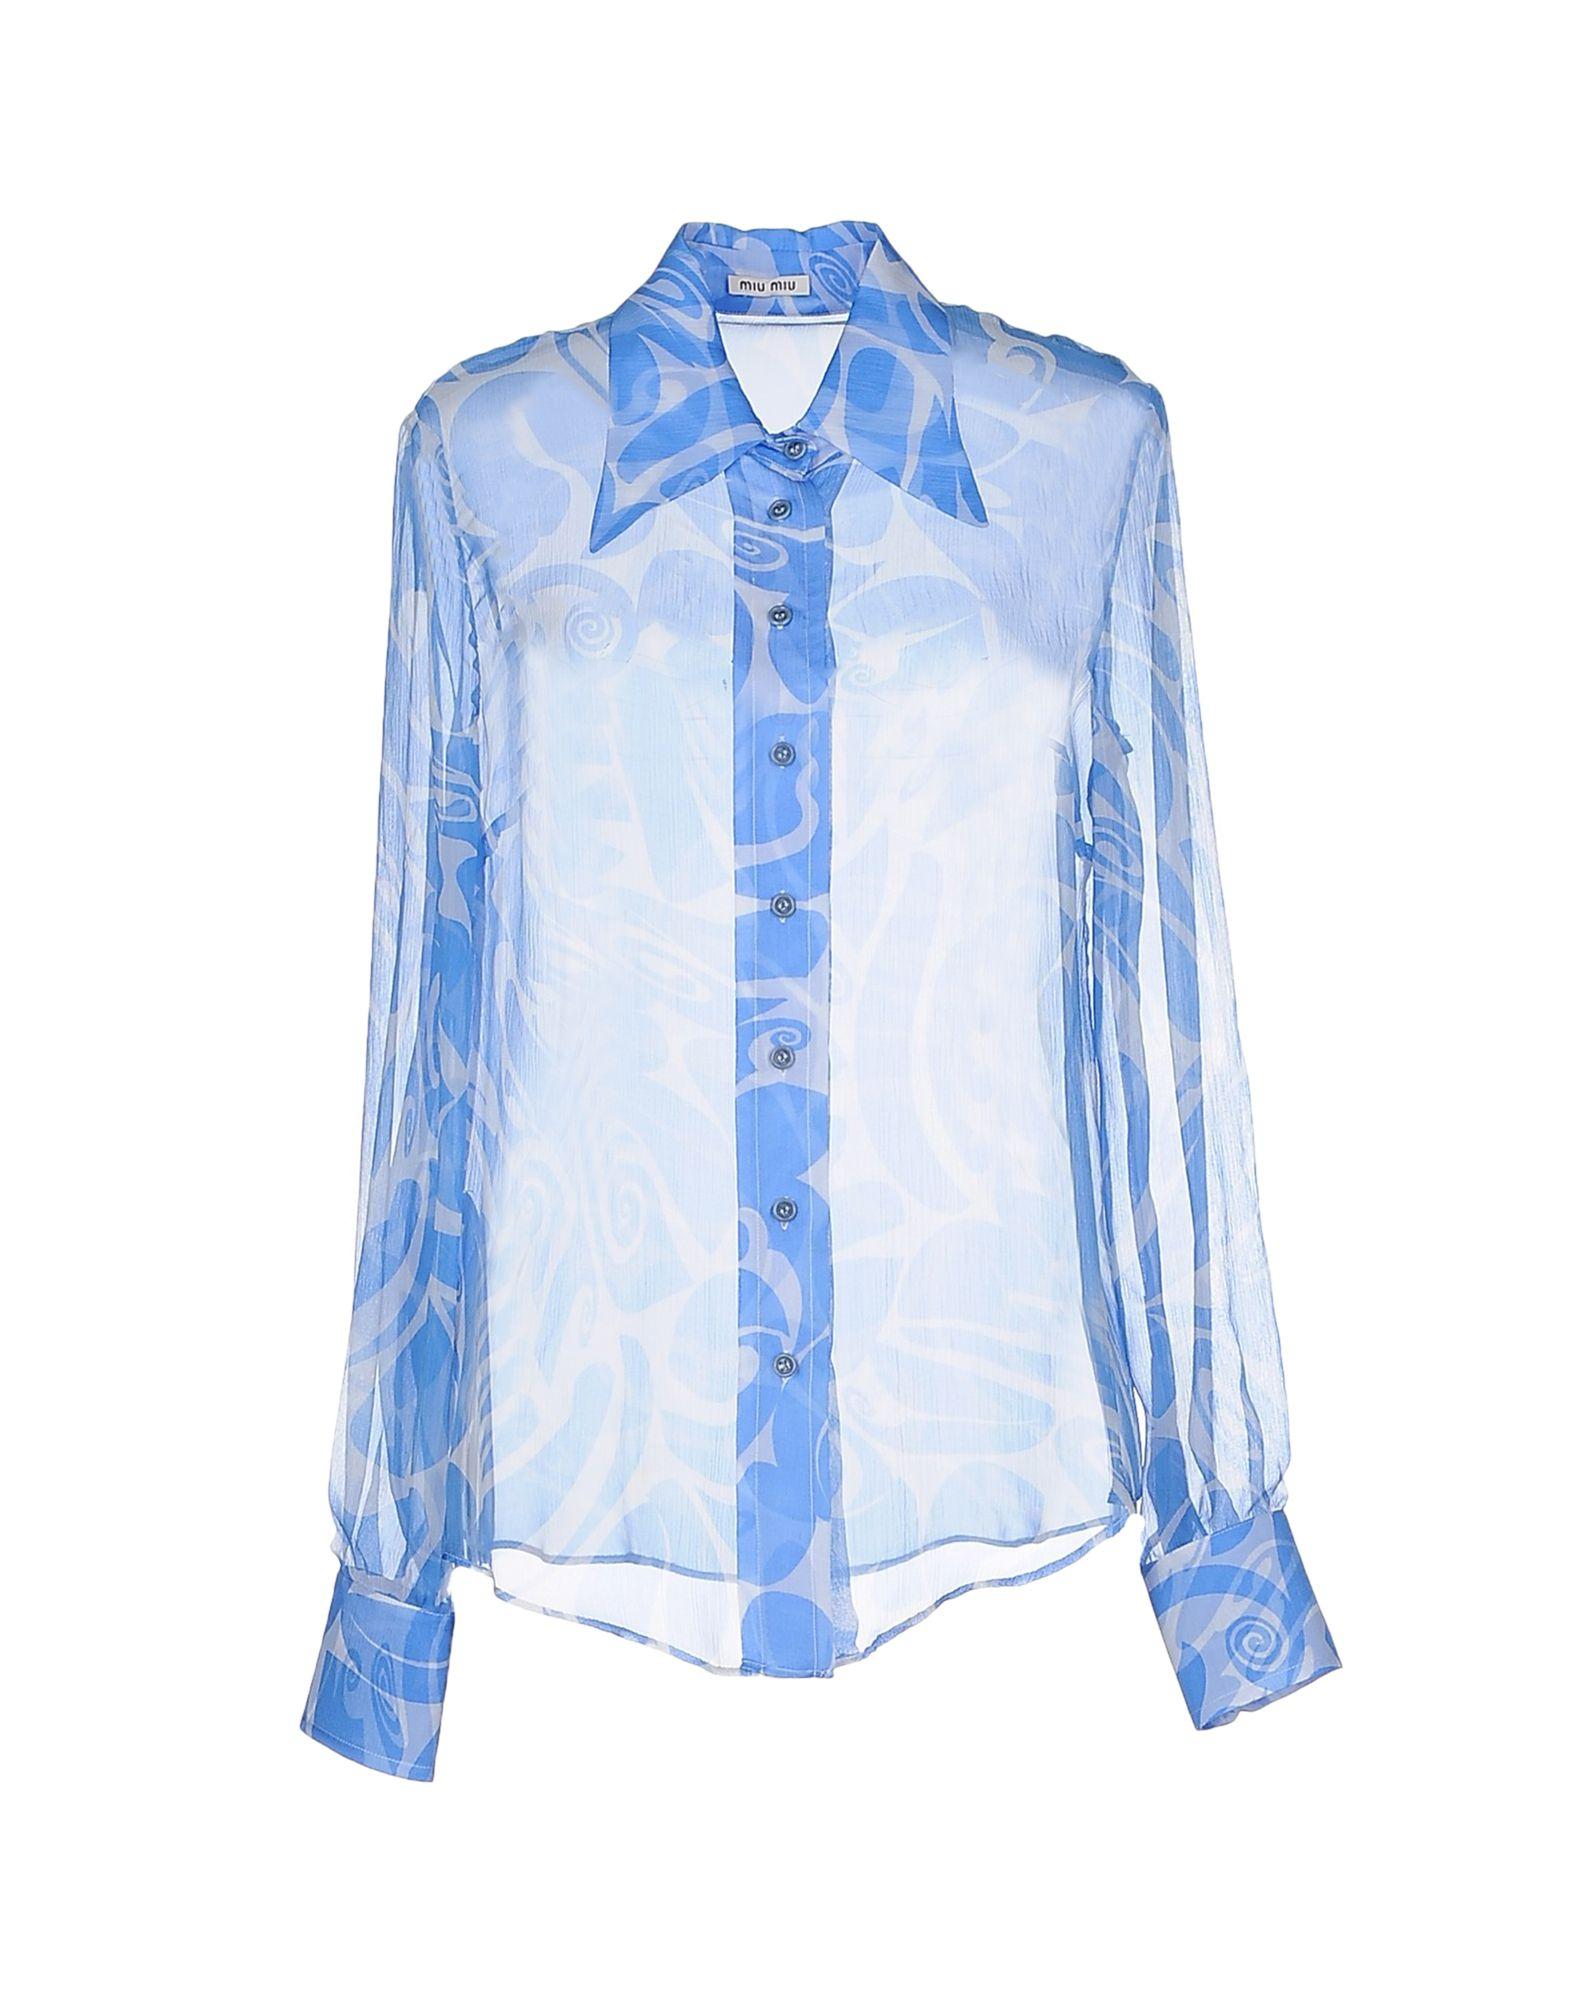 Miu miu shirt in blue lyst for Miu miu t shirt